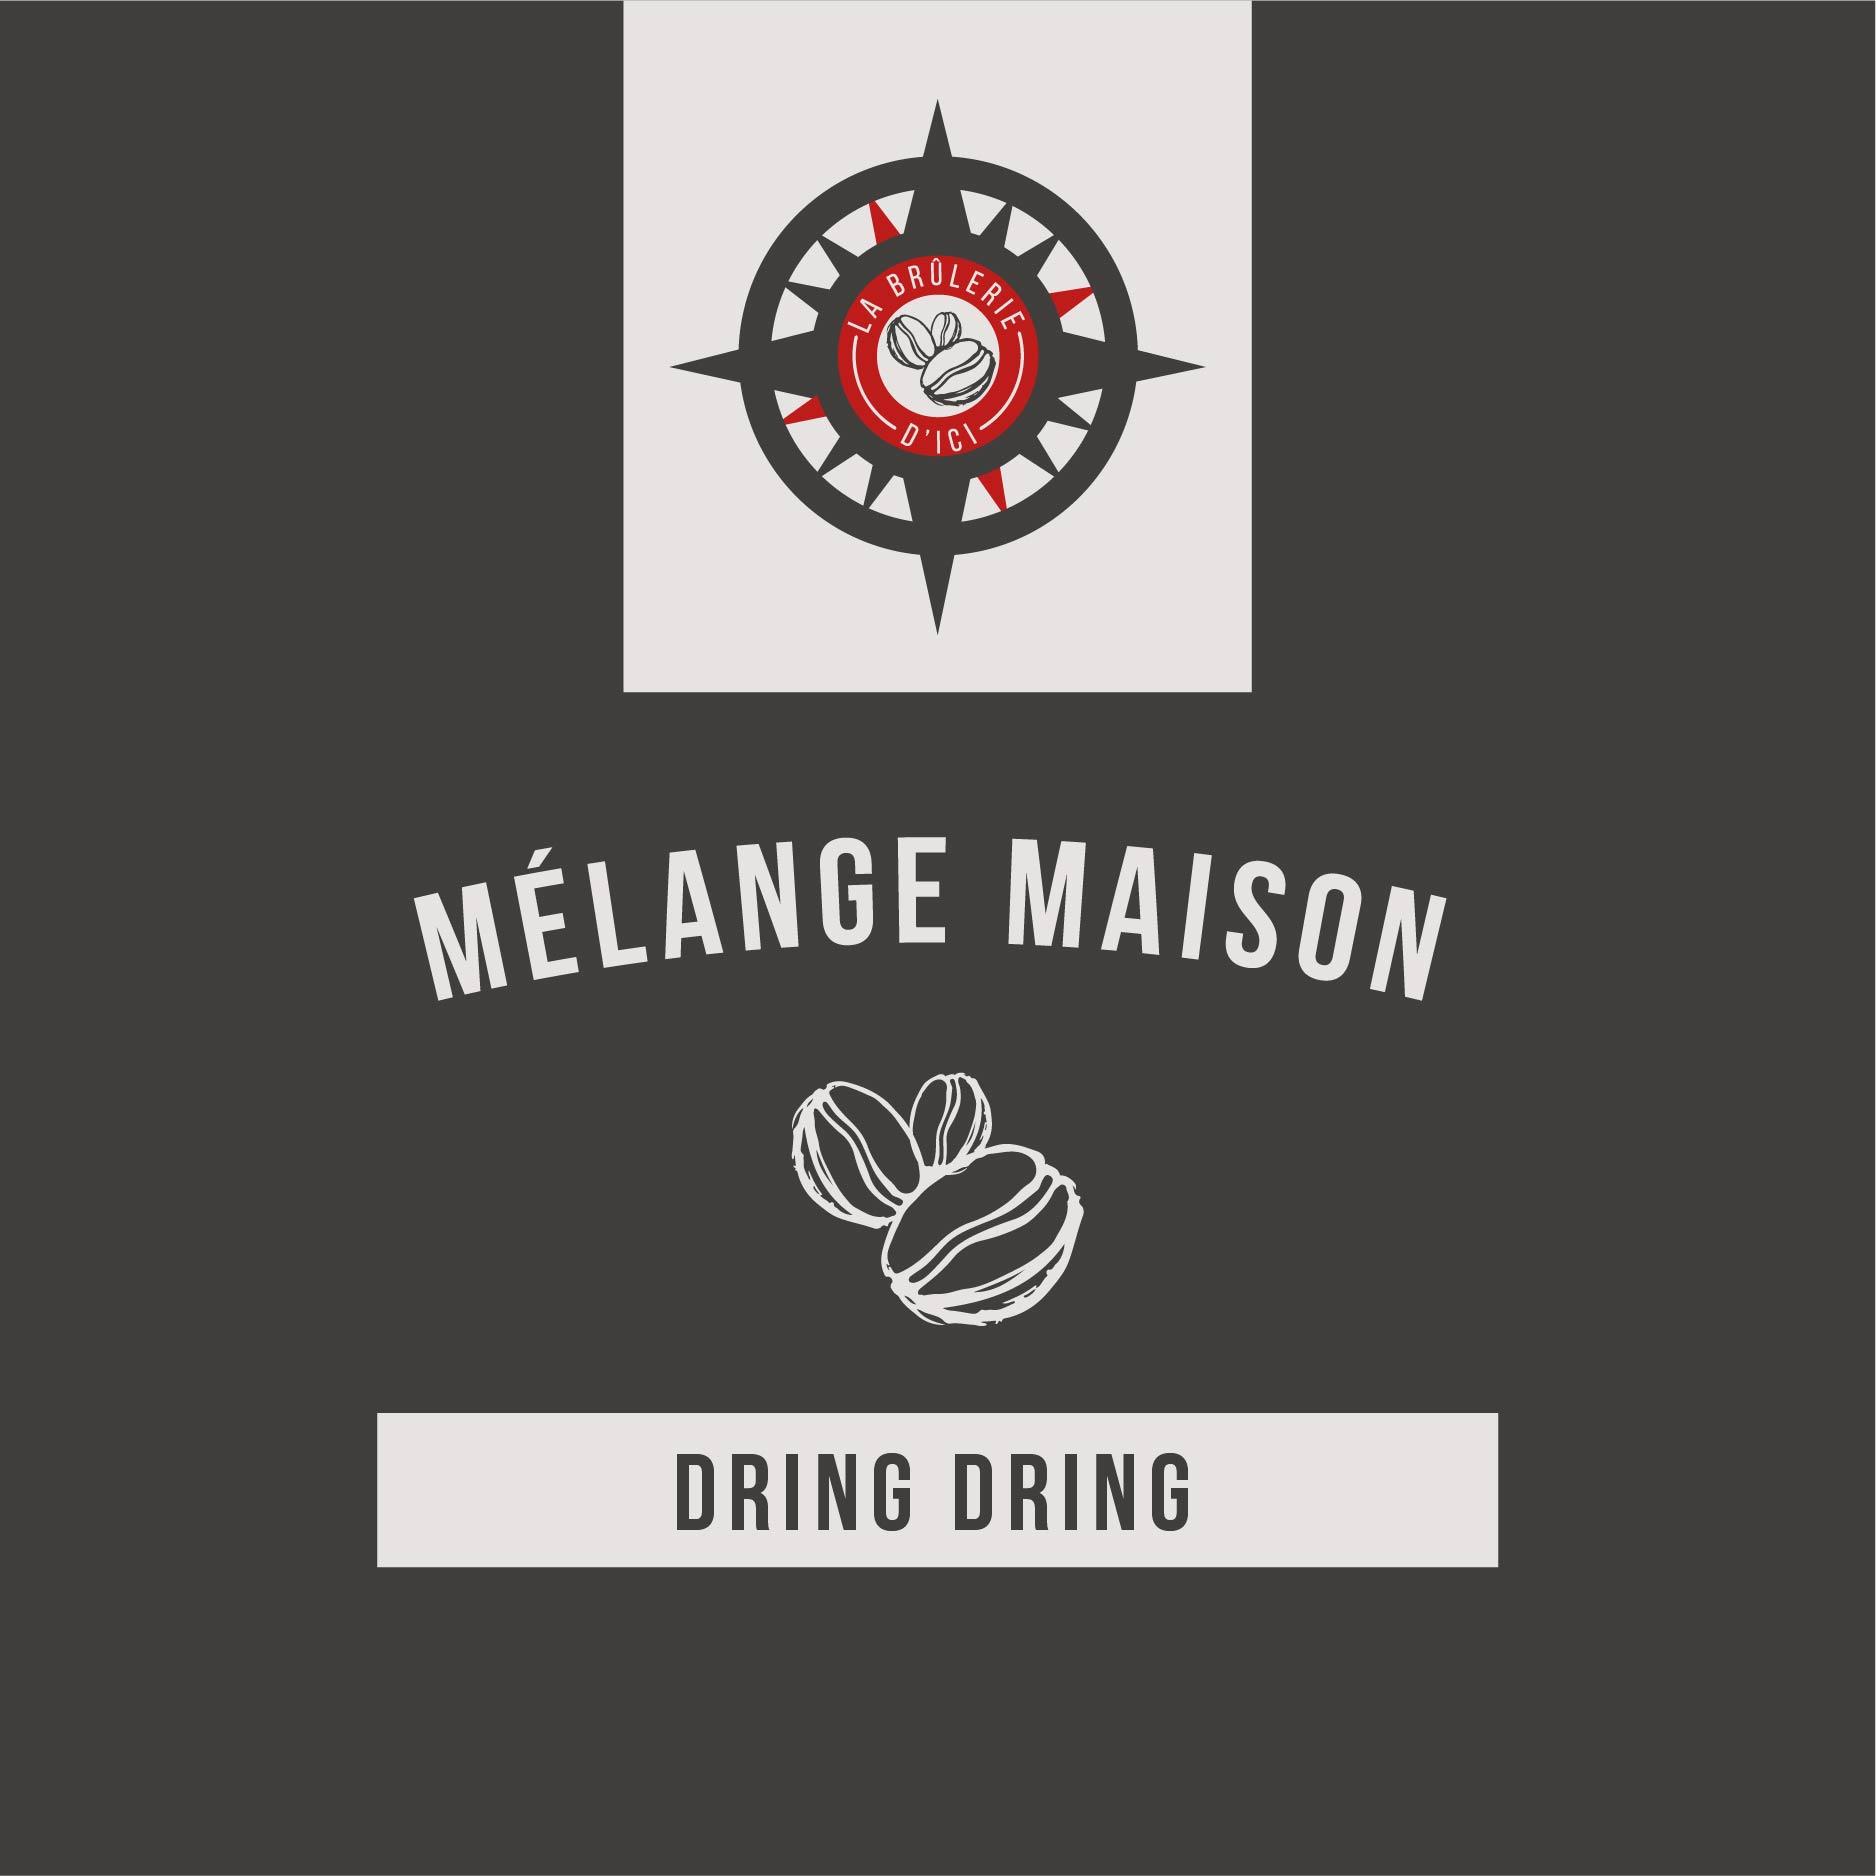 Dring Dring - Mélange maison